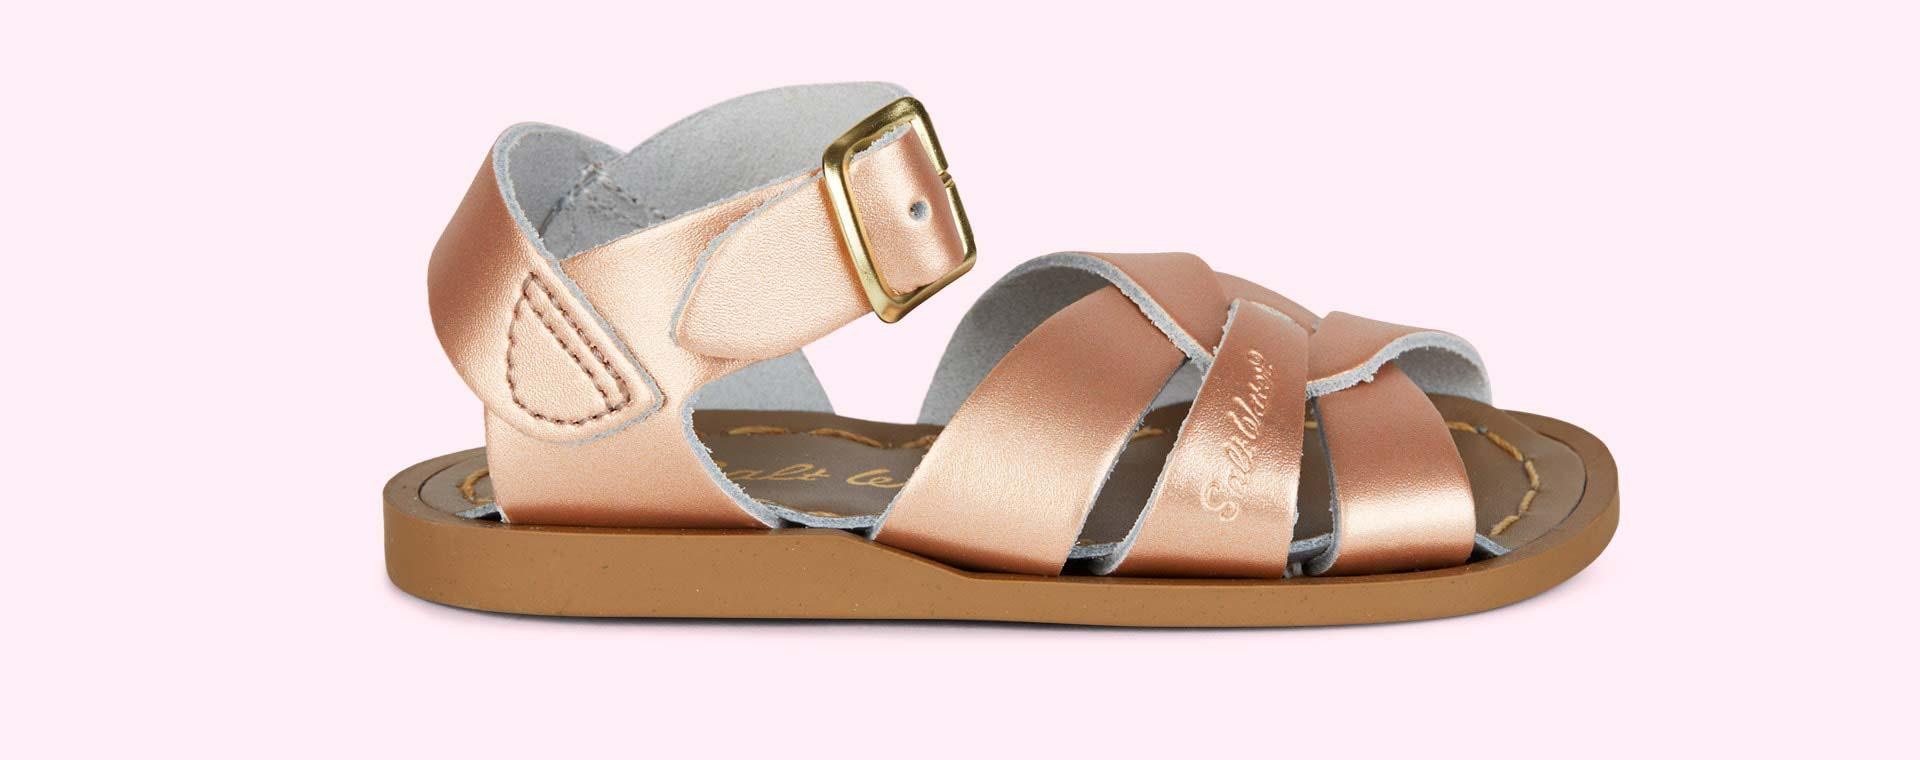 Rose Gold Salt-Water Sandals The Original Salt Water Sandal